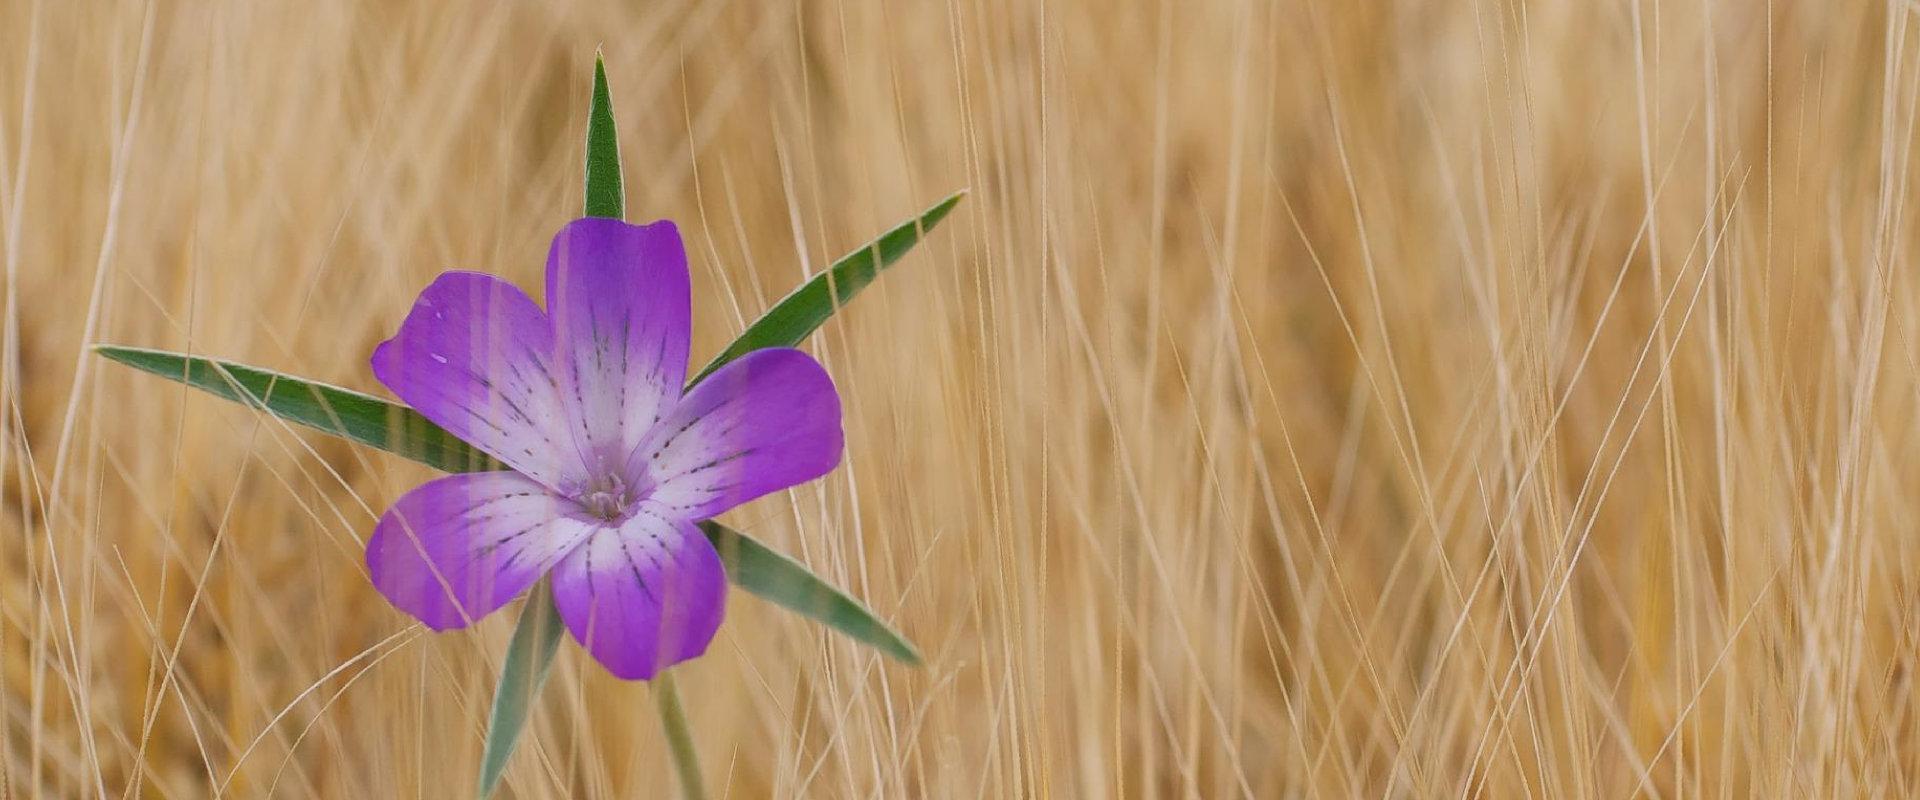 Blume im Kornfeld